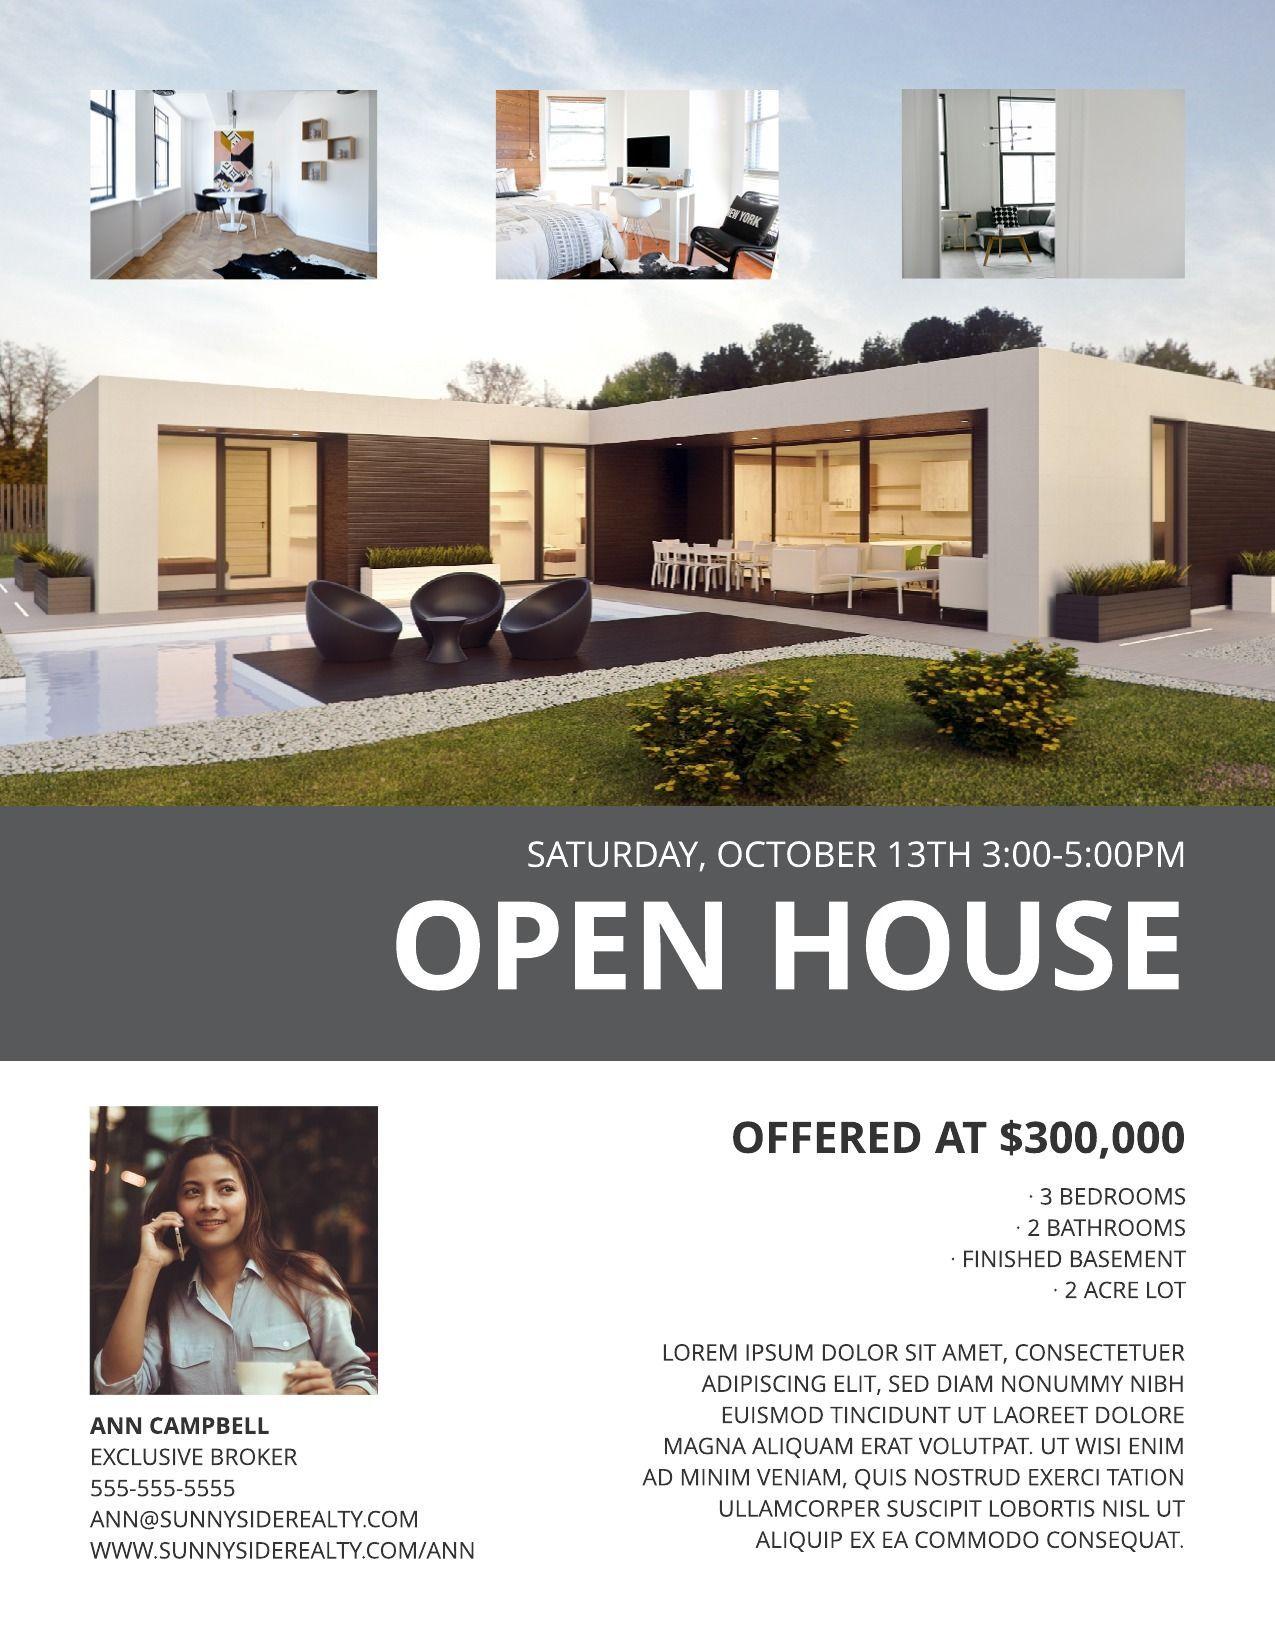 003 Best Open House Flyer Template Design  Templates Word Free Microsoft Real EstateFull